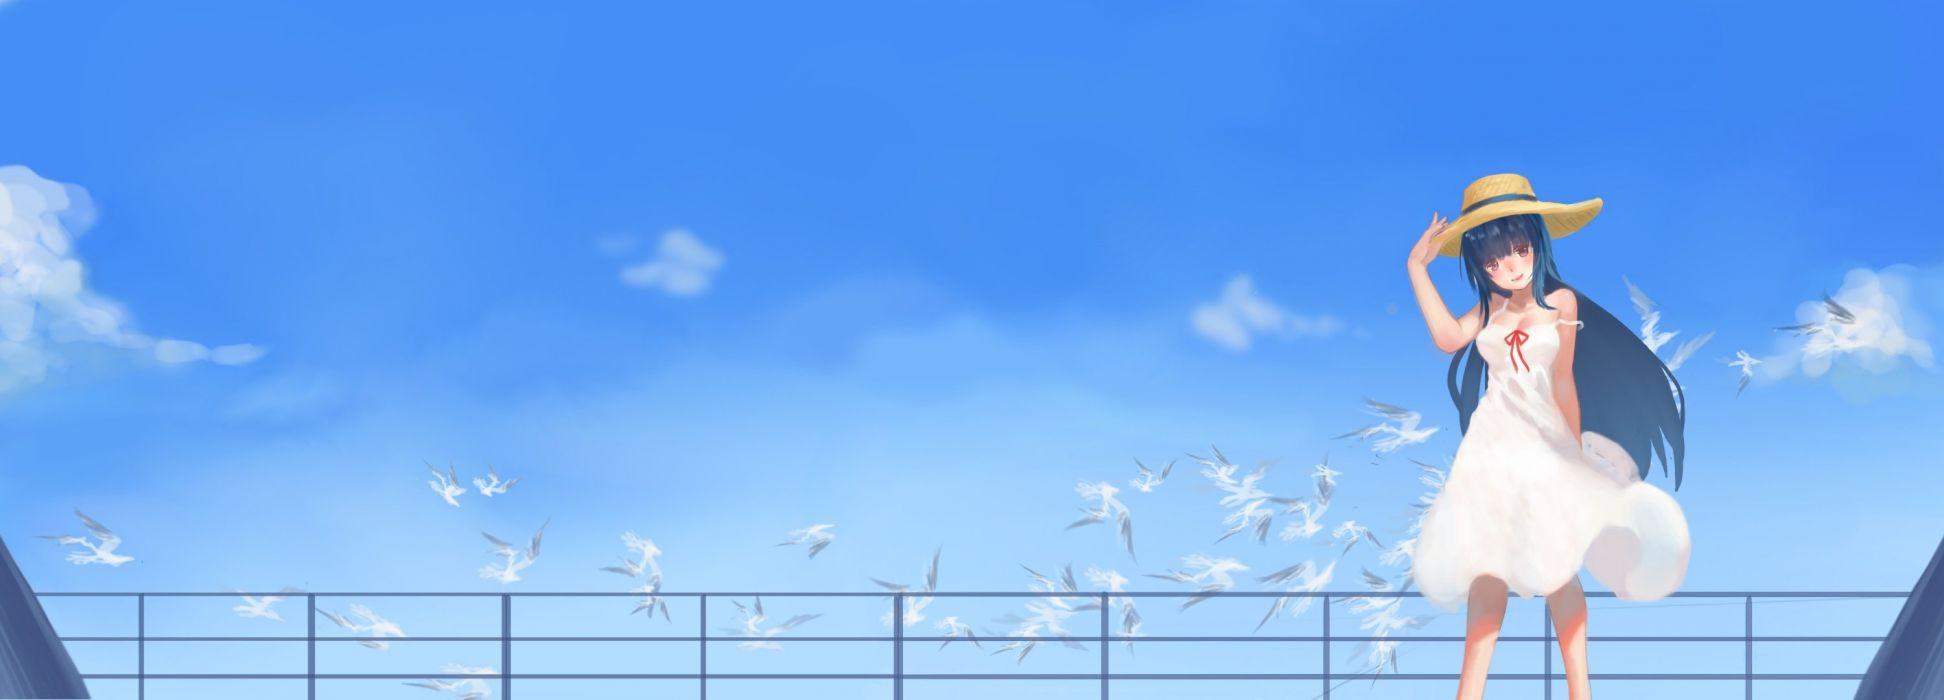 animal bird black hair dualscreen hat long hair photoshop sky summer dress yuuuuuuuuuuuuka zhanjian shaonu wallpaper